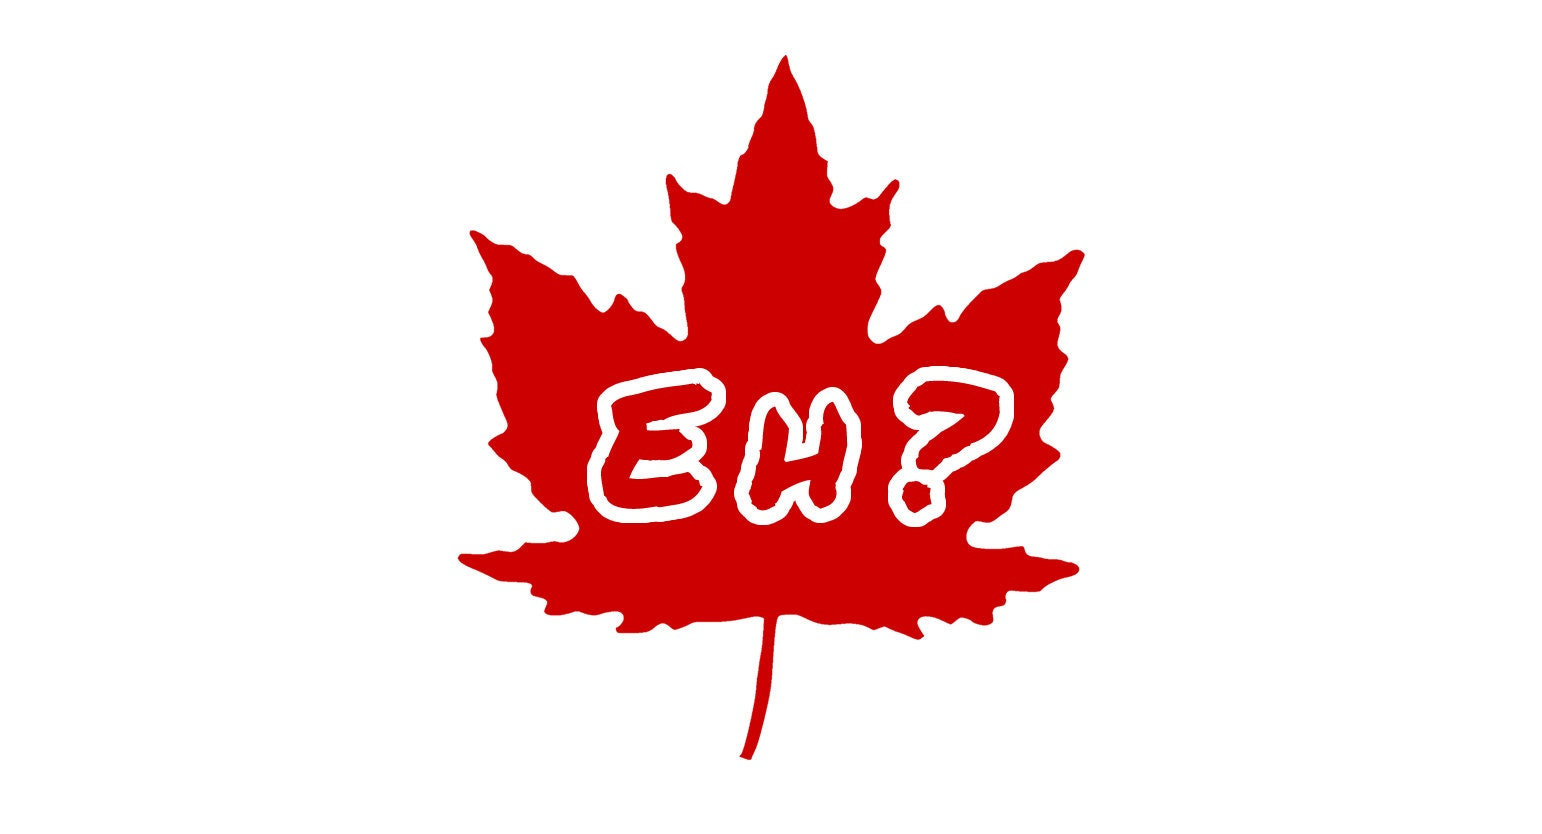 CAD$9.74 - Canada vinyl decal